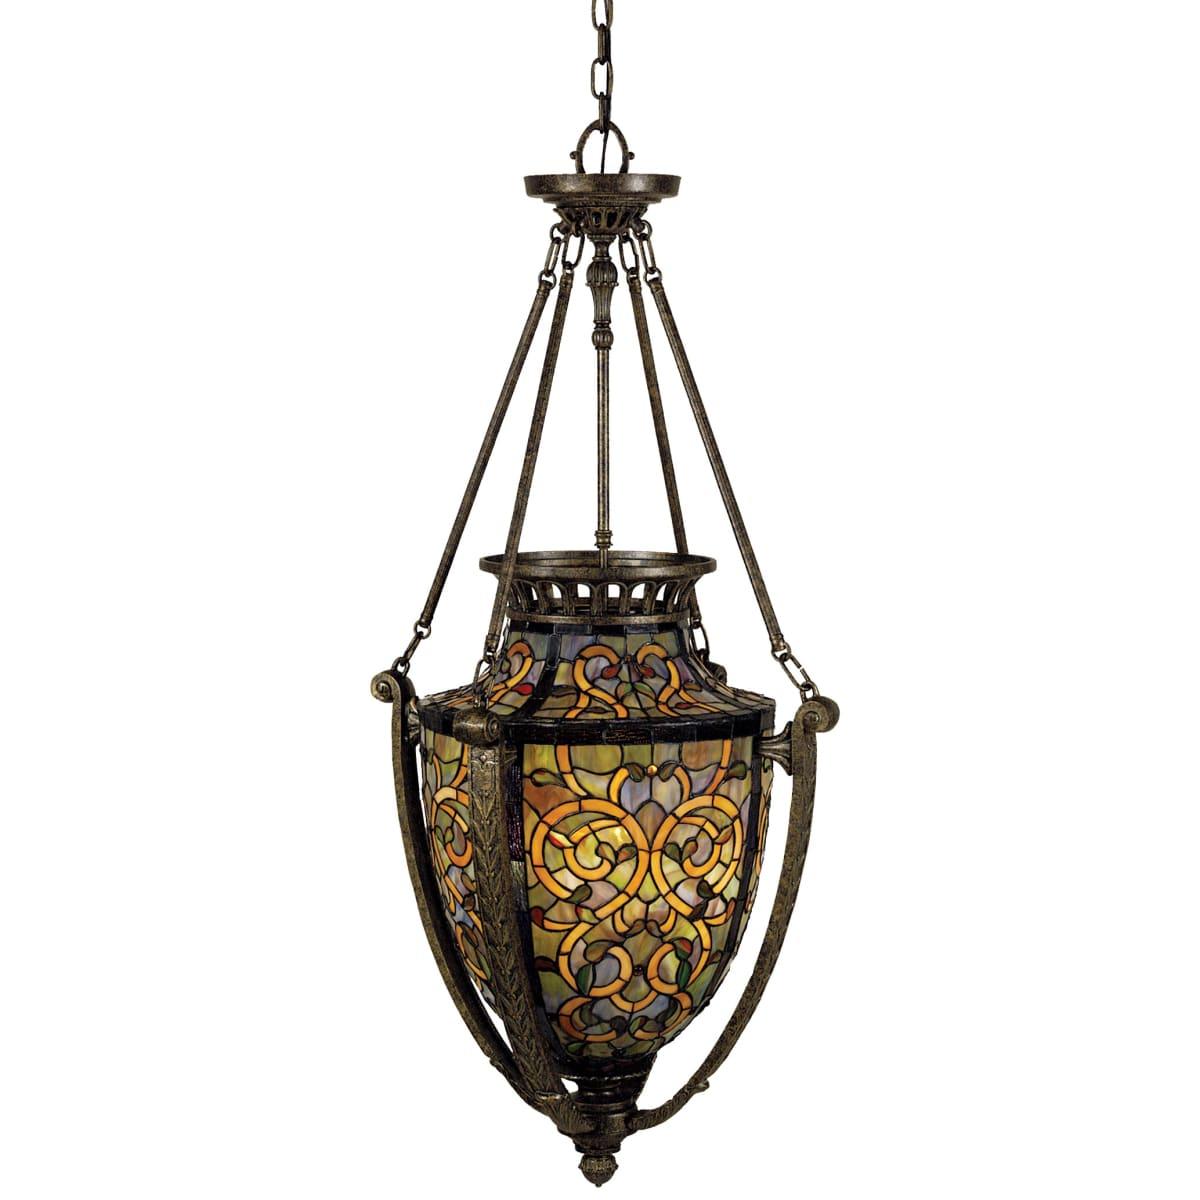 meet 6f1c9 ef2e4 Quoizel TF1721ML Malaga Tiffany 4 Light Urn Pendant with ...